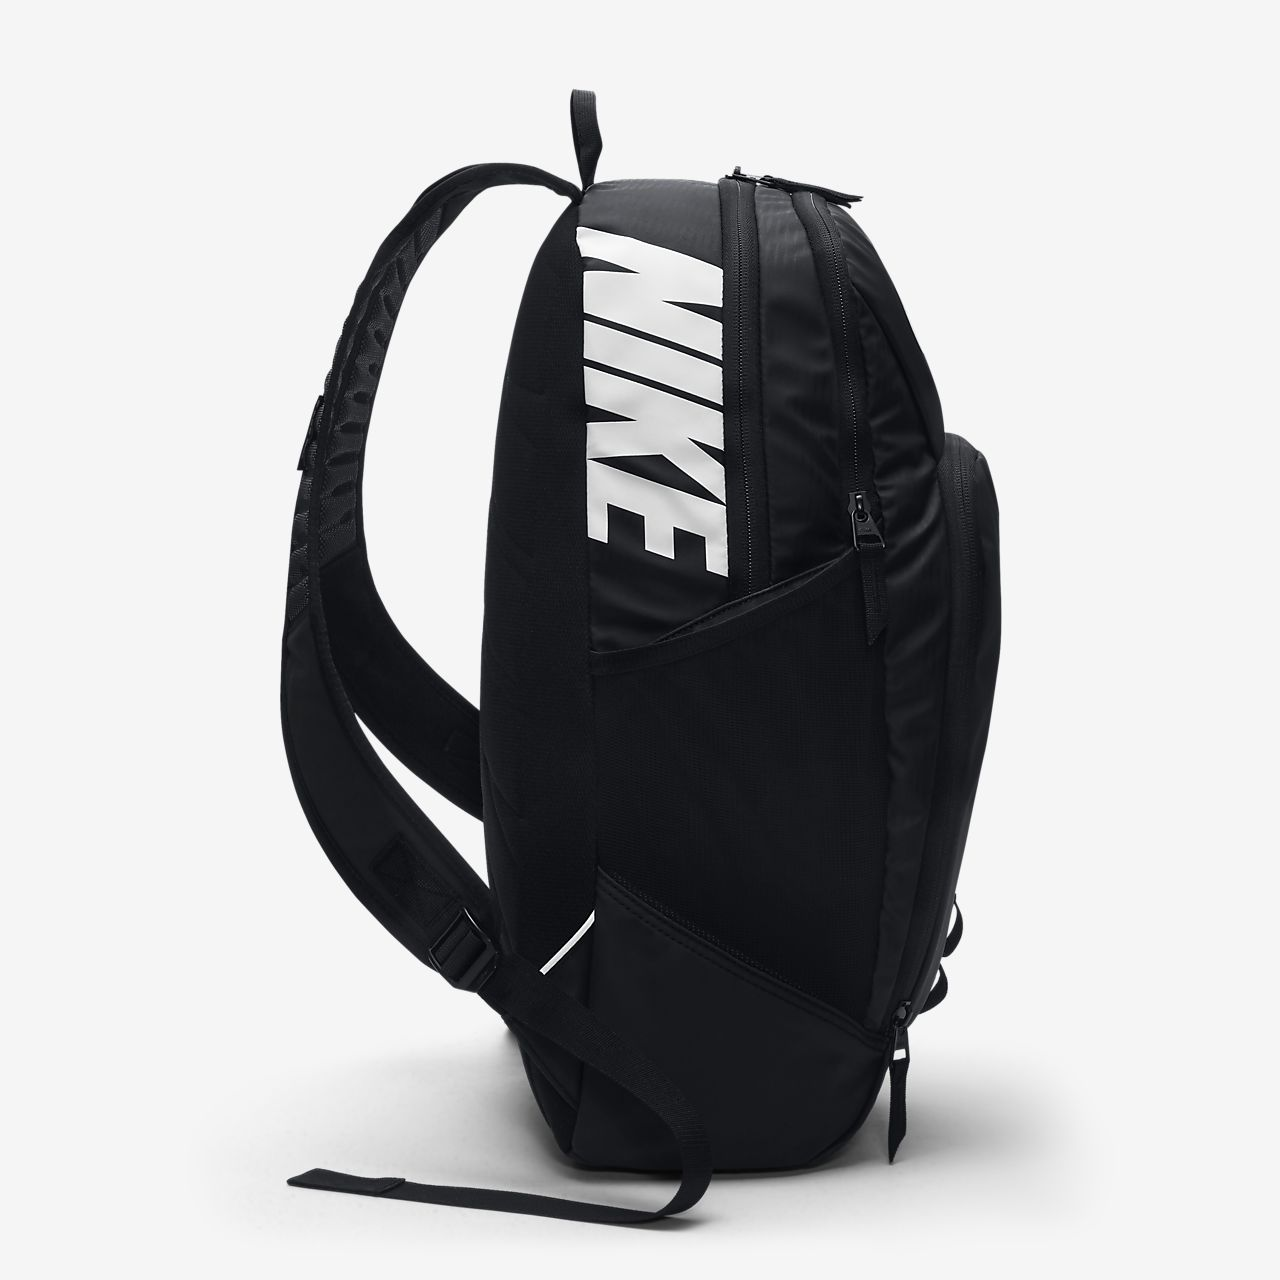 26f55a6312d5 Nike Alpha Adapt Rev Backpack. Nike.com SG